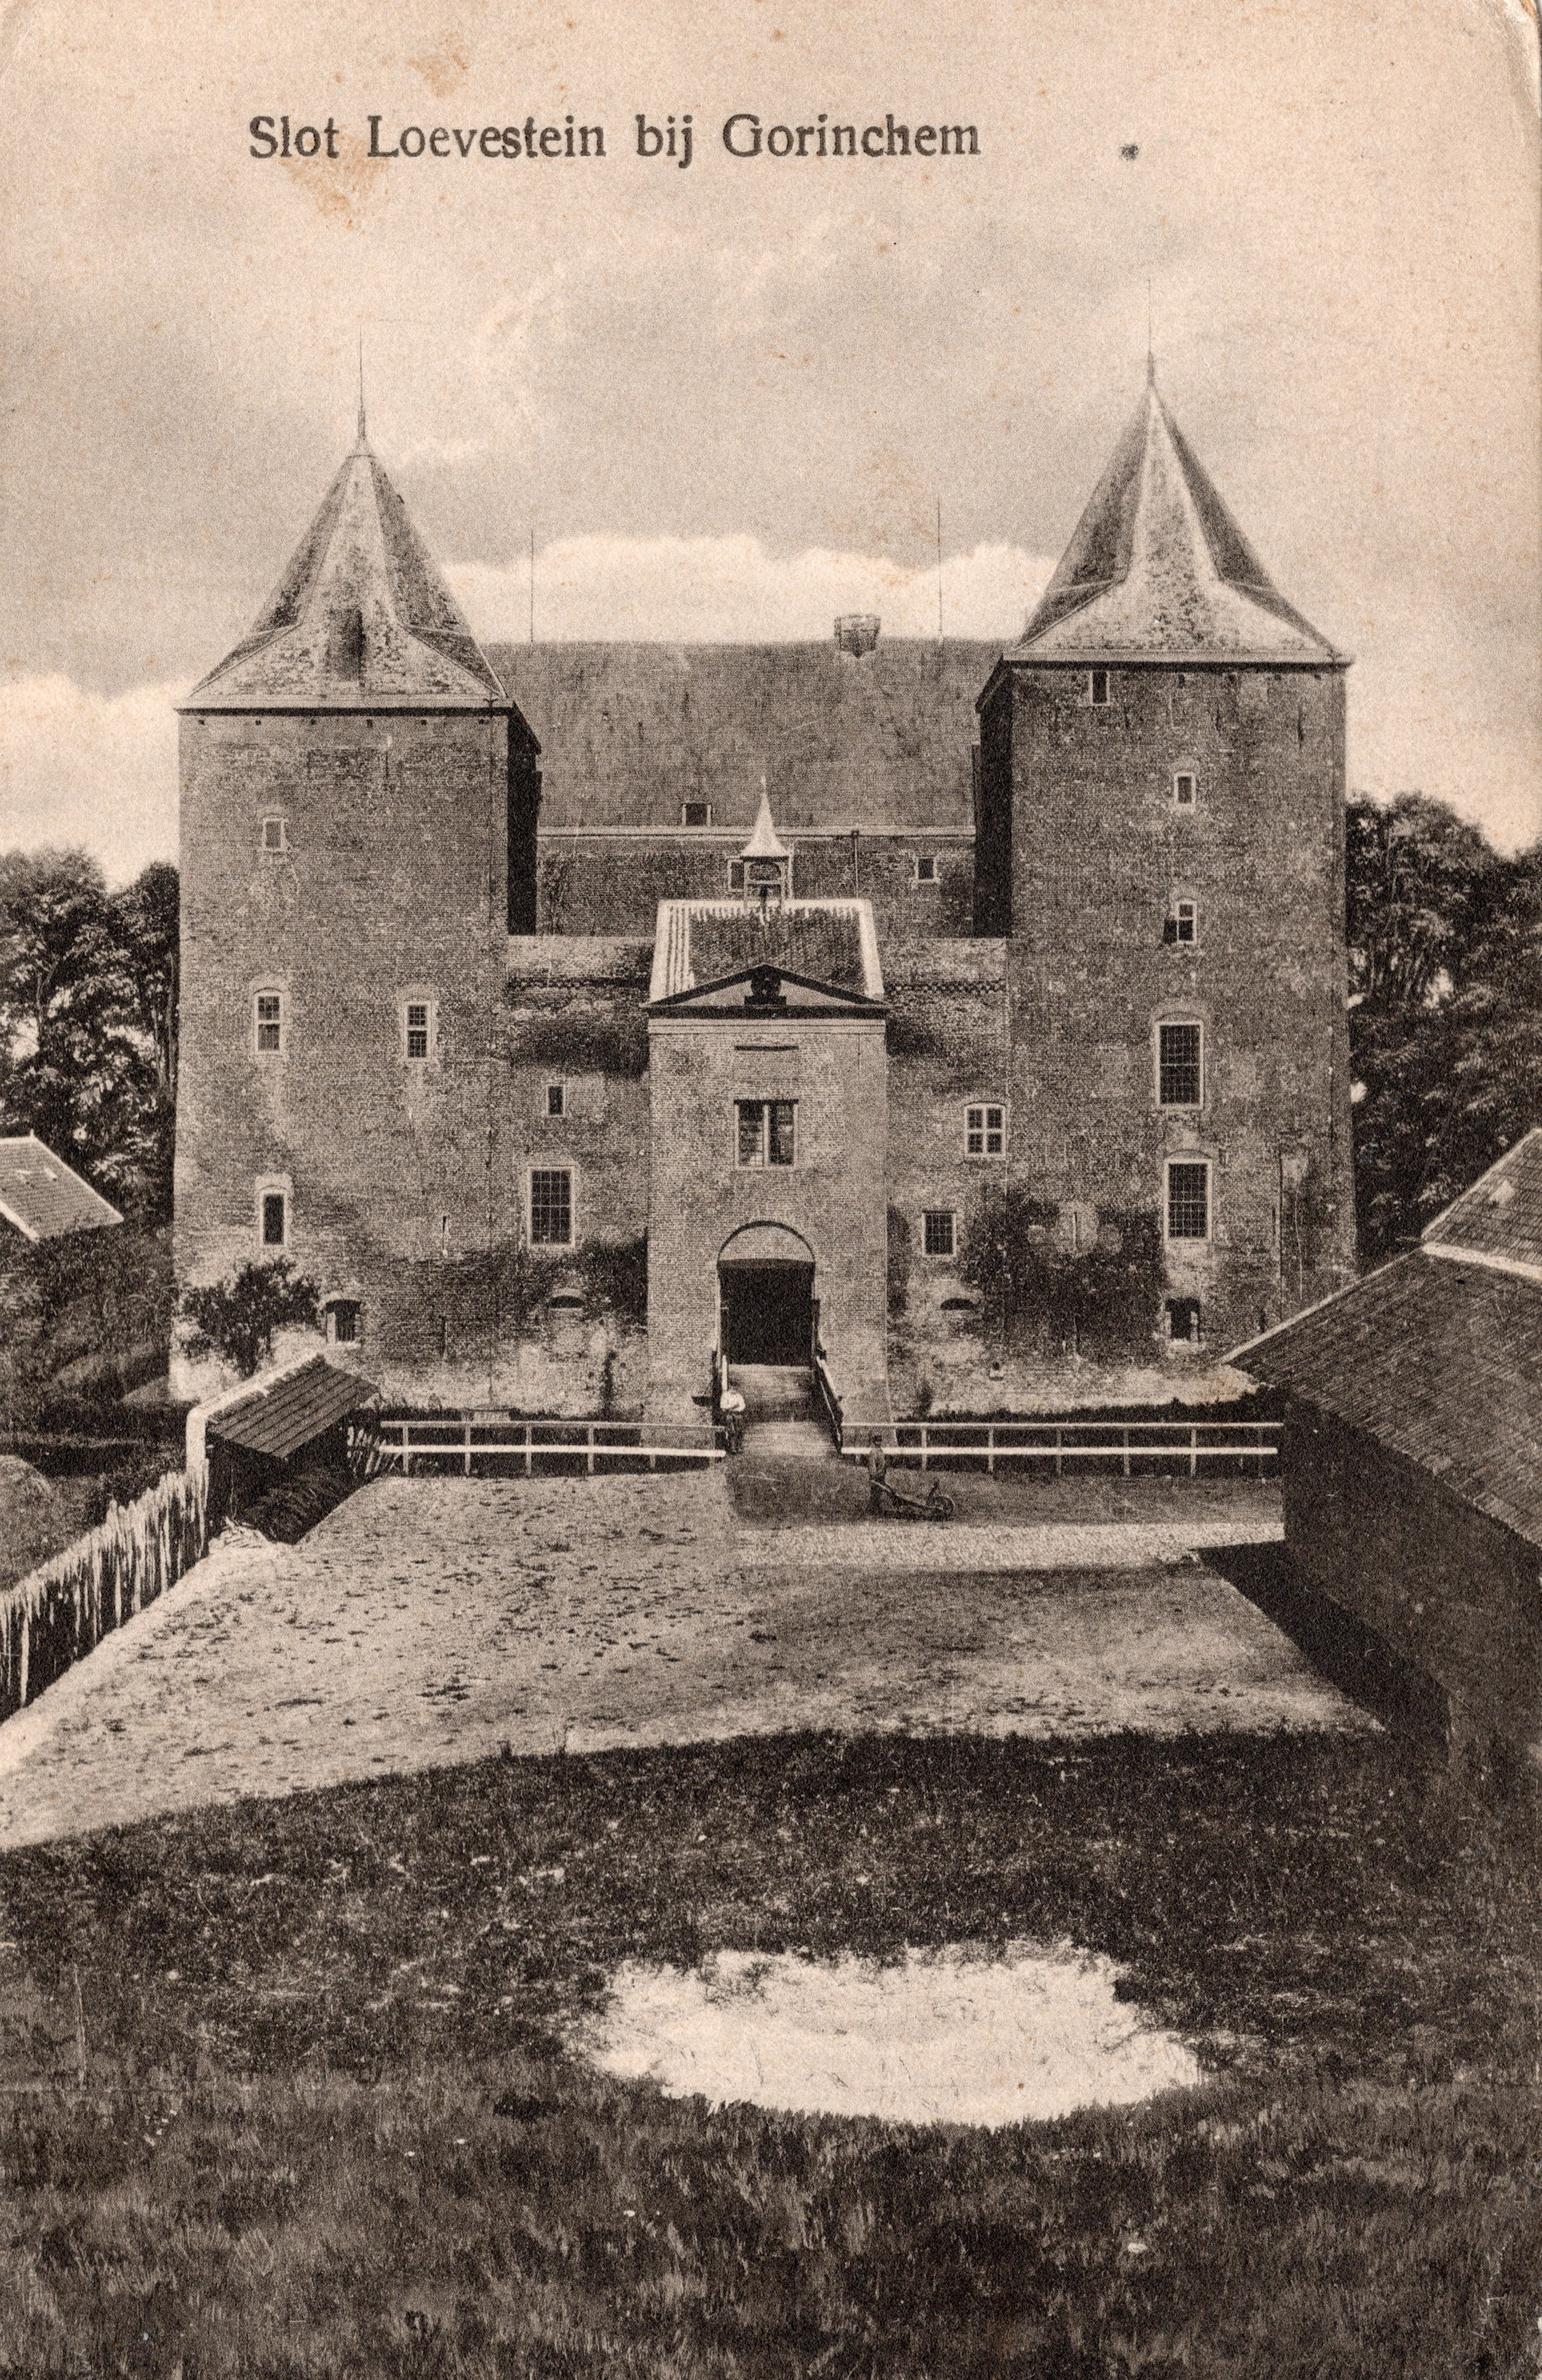 A3-Slot-Loevestein-bij-Gorinchem-1924